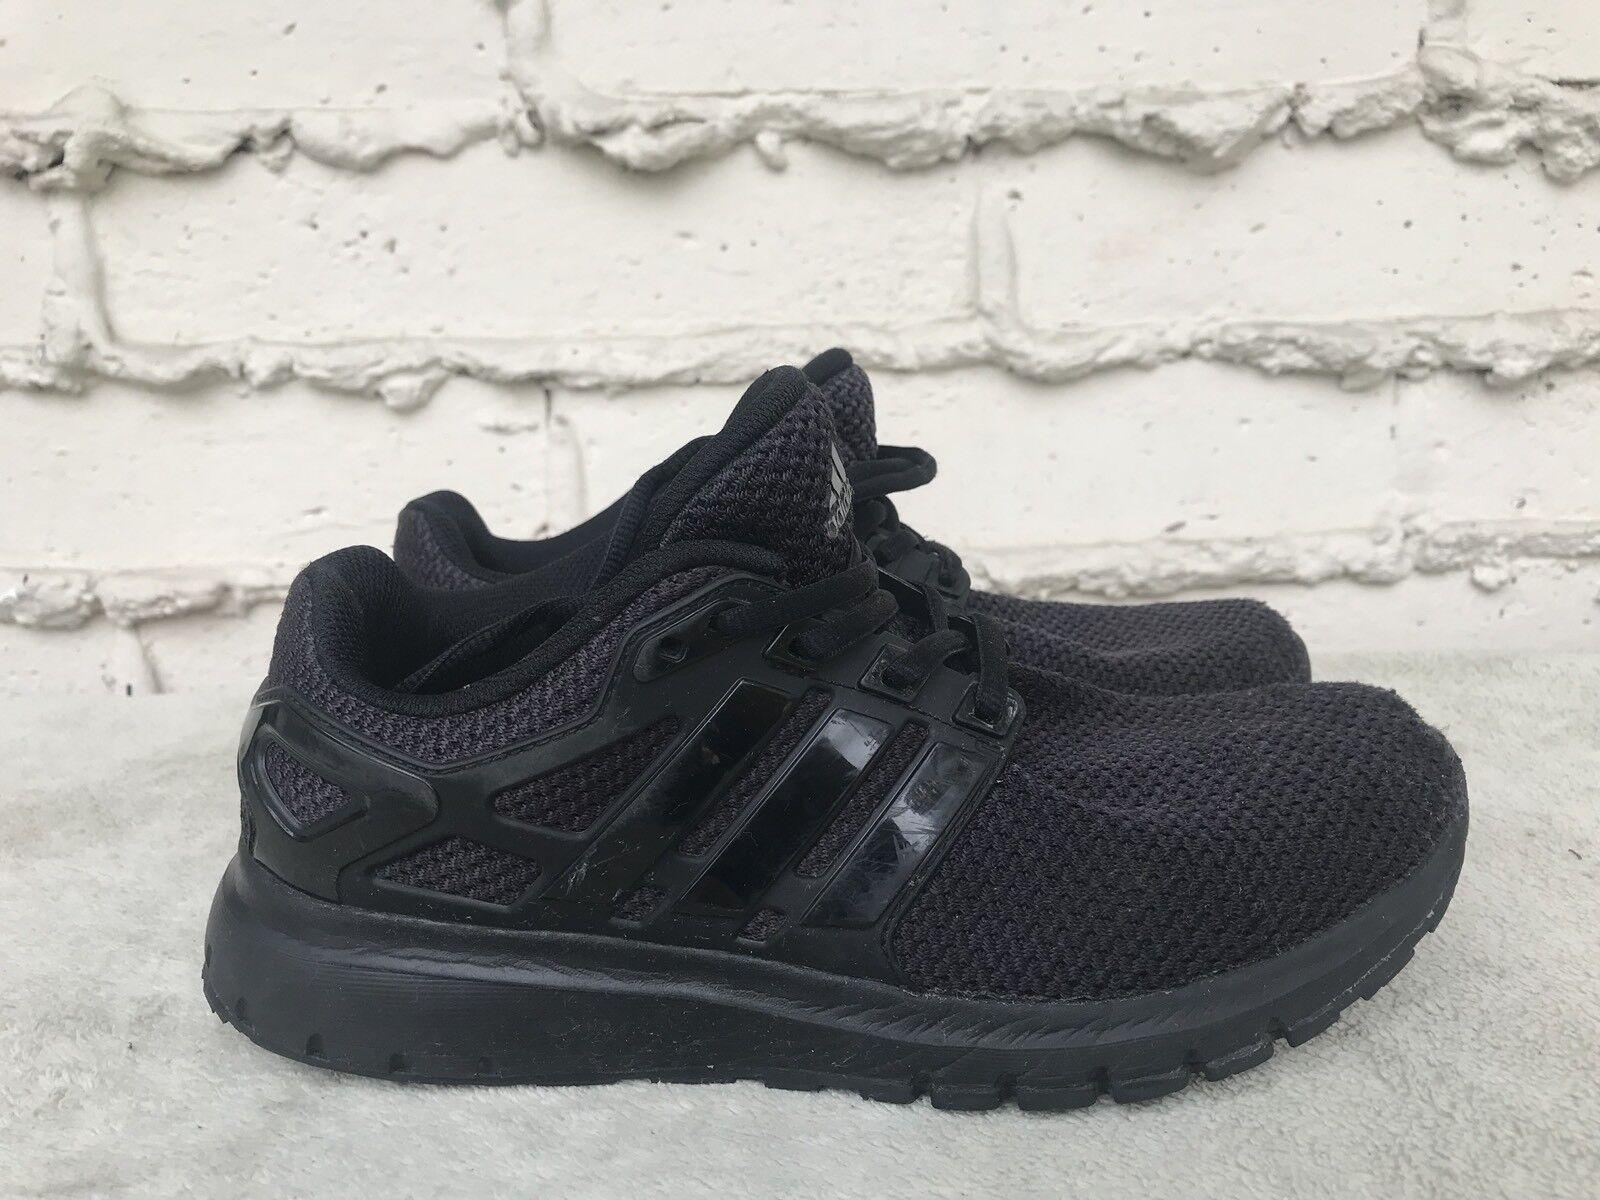 Men's Adidas Energy Cloud WTC Black Running Athletic Sport Shoes S81023 Sz US 8 Casual wild